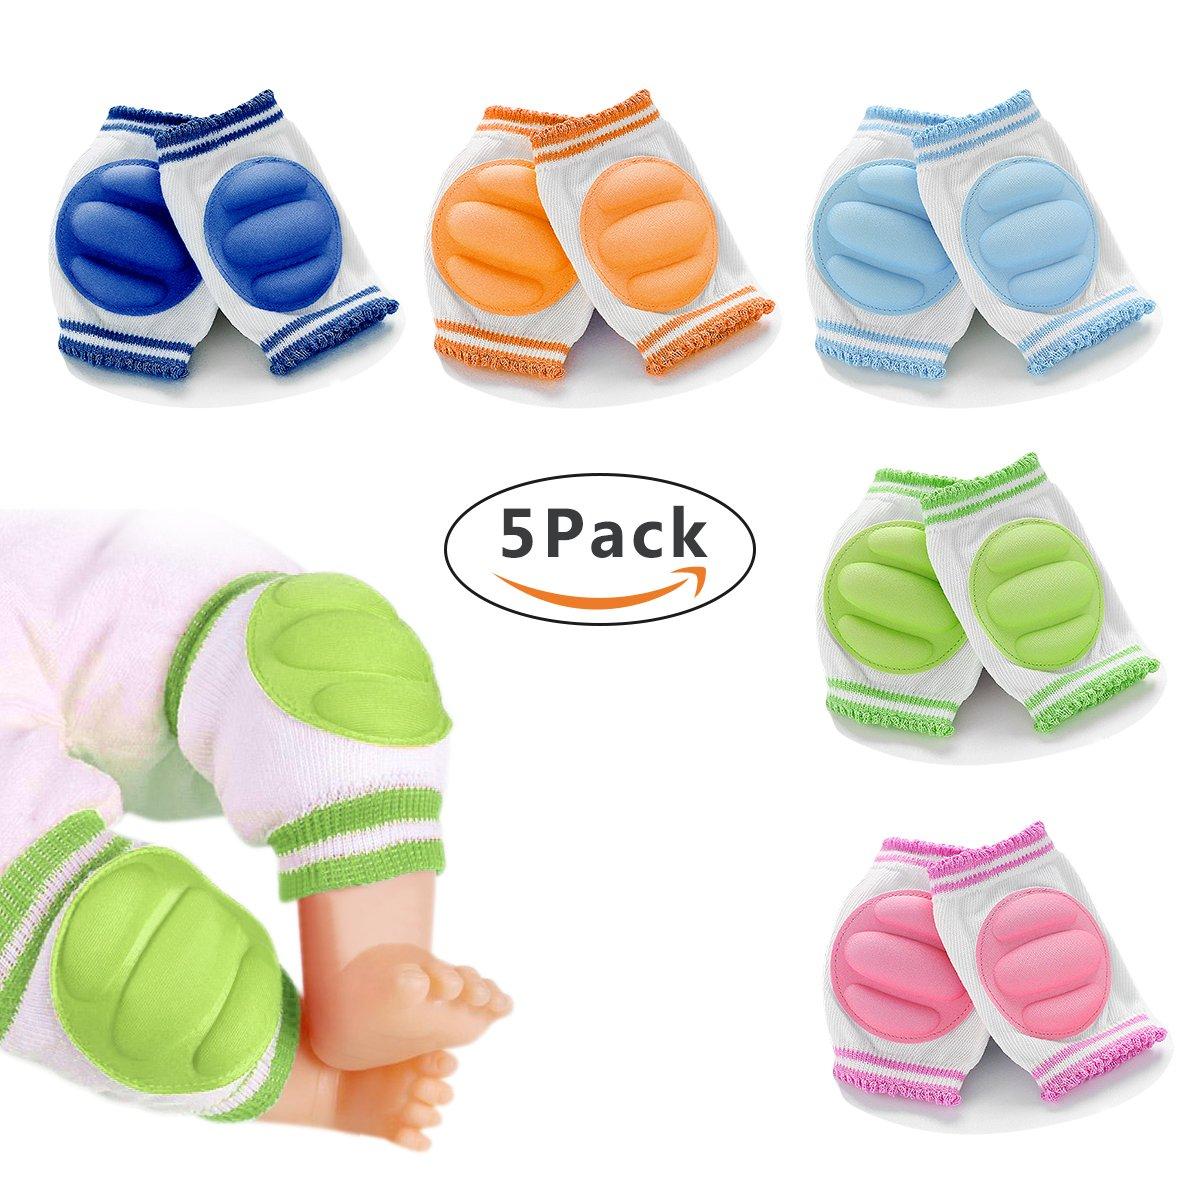 Unsex 5xpacks Cotton Baby Toddlers Kneepads Crawling Anti-Slip Knee Leg Warmers 4.7x3.5inch (5Pack SuperBK)